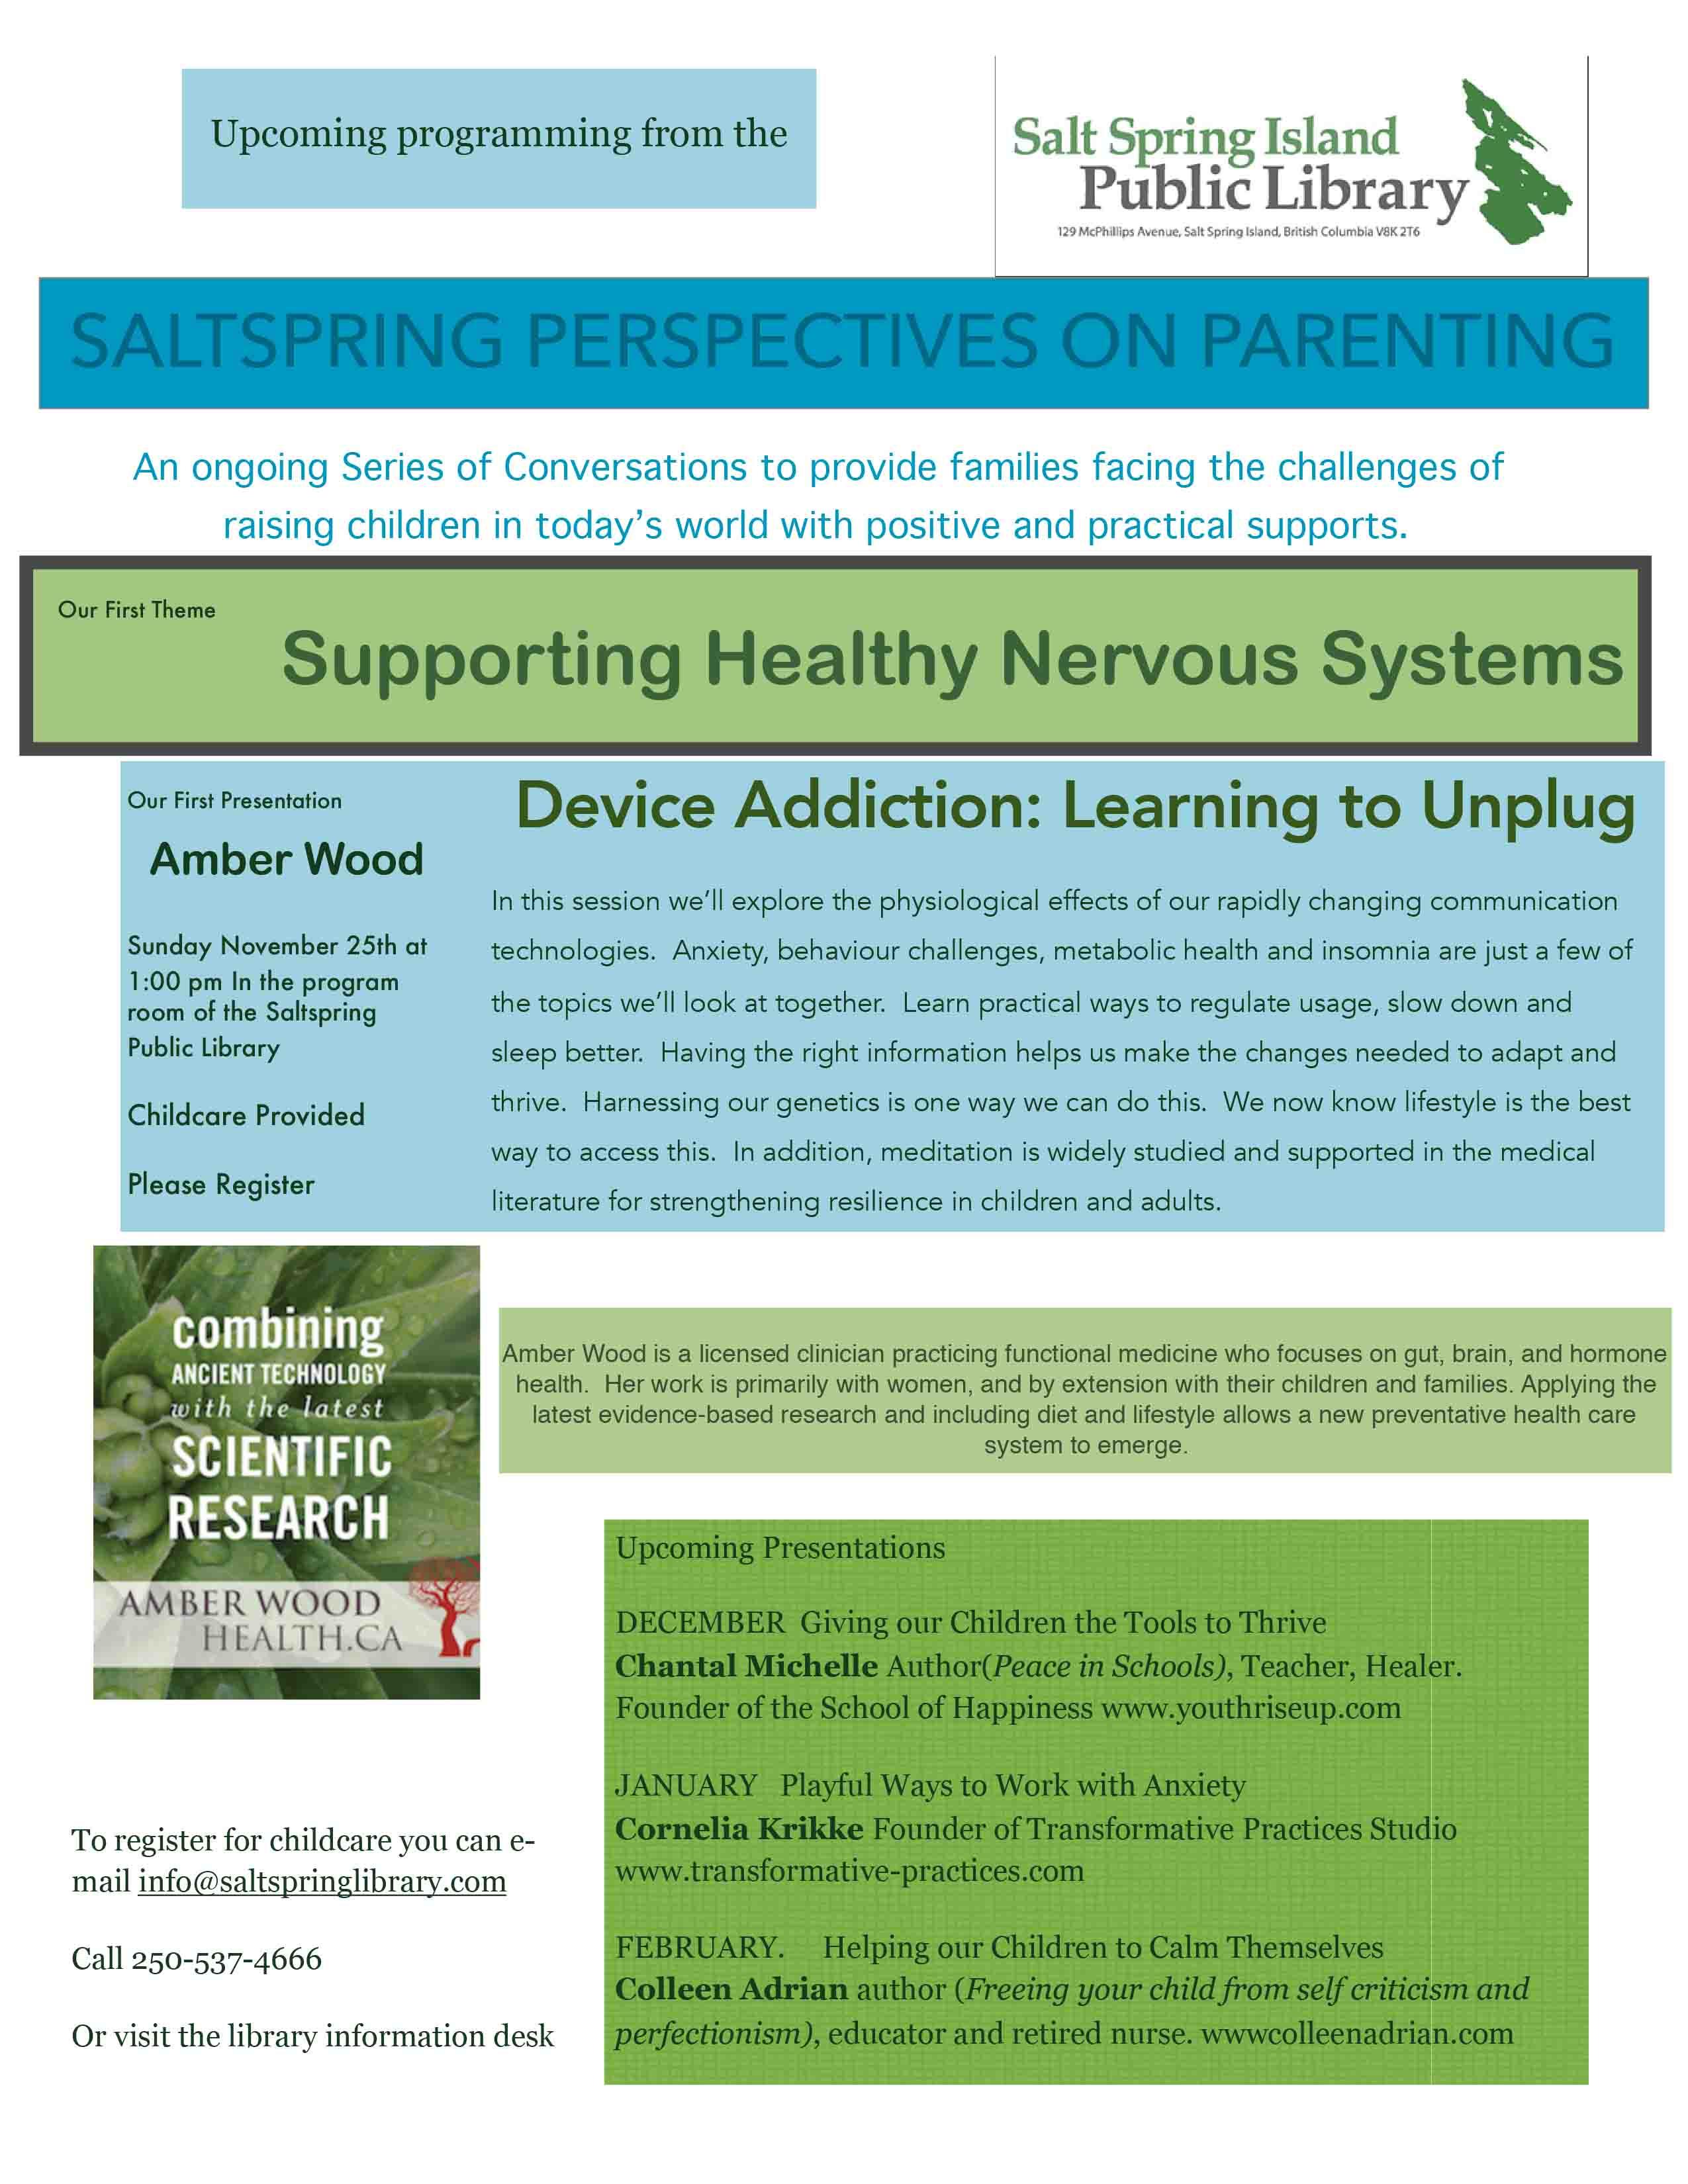 Amber Wood: Device Addiction @ Community Program Room